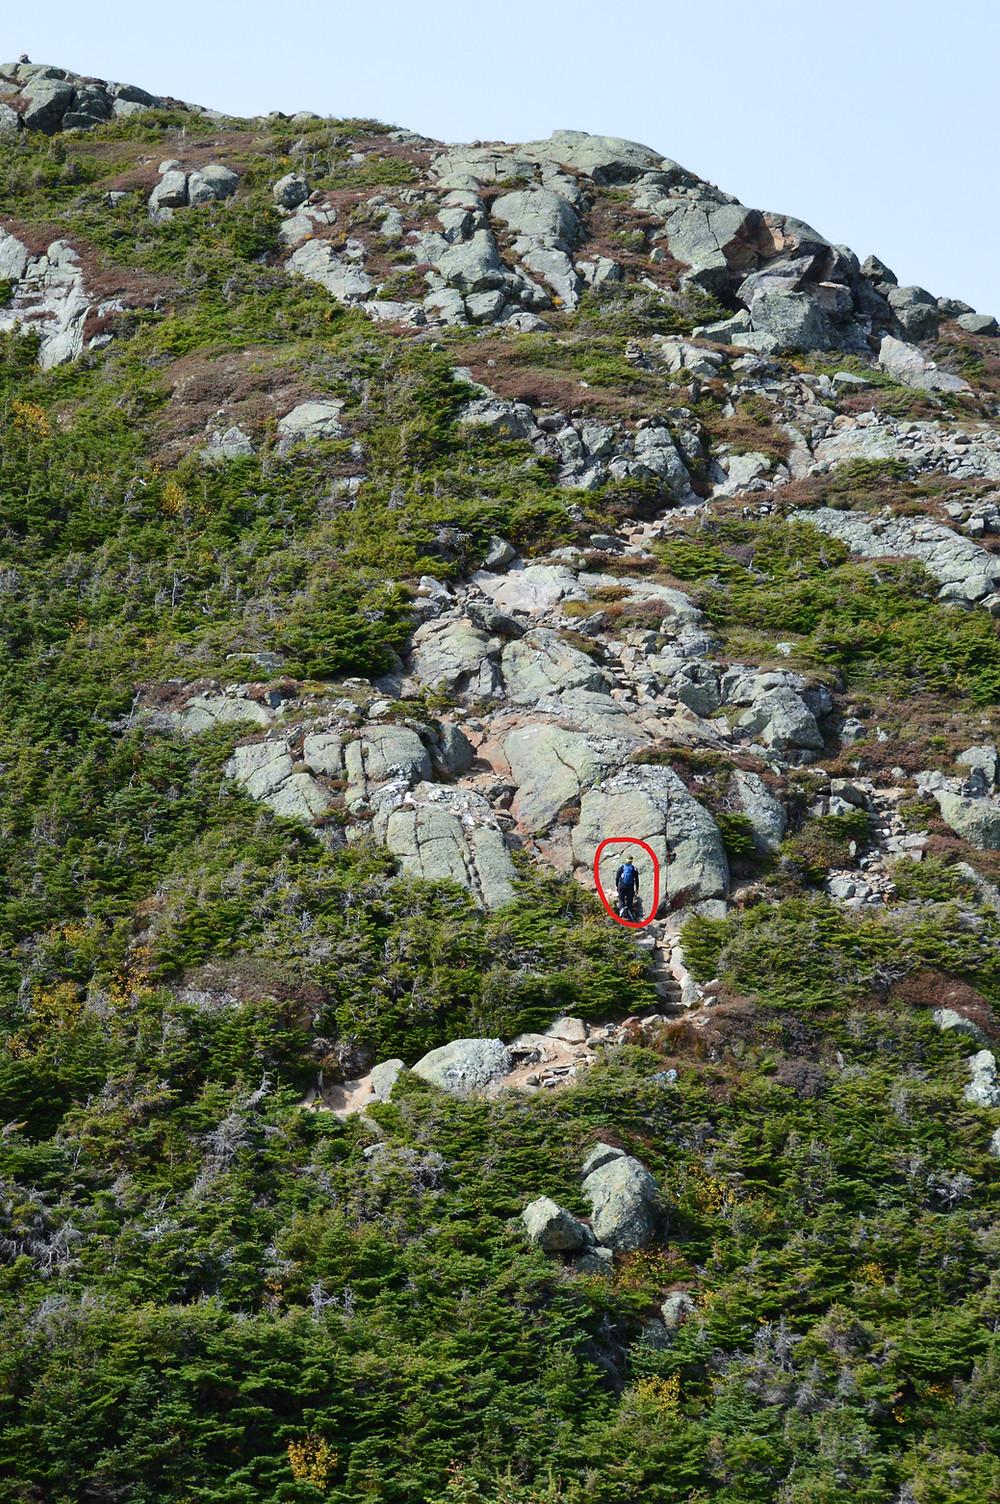 Hiker climbing rocky crag on Mt Eisenhower Loop Trail